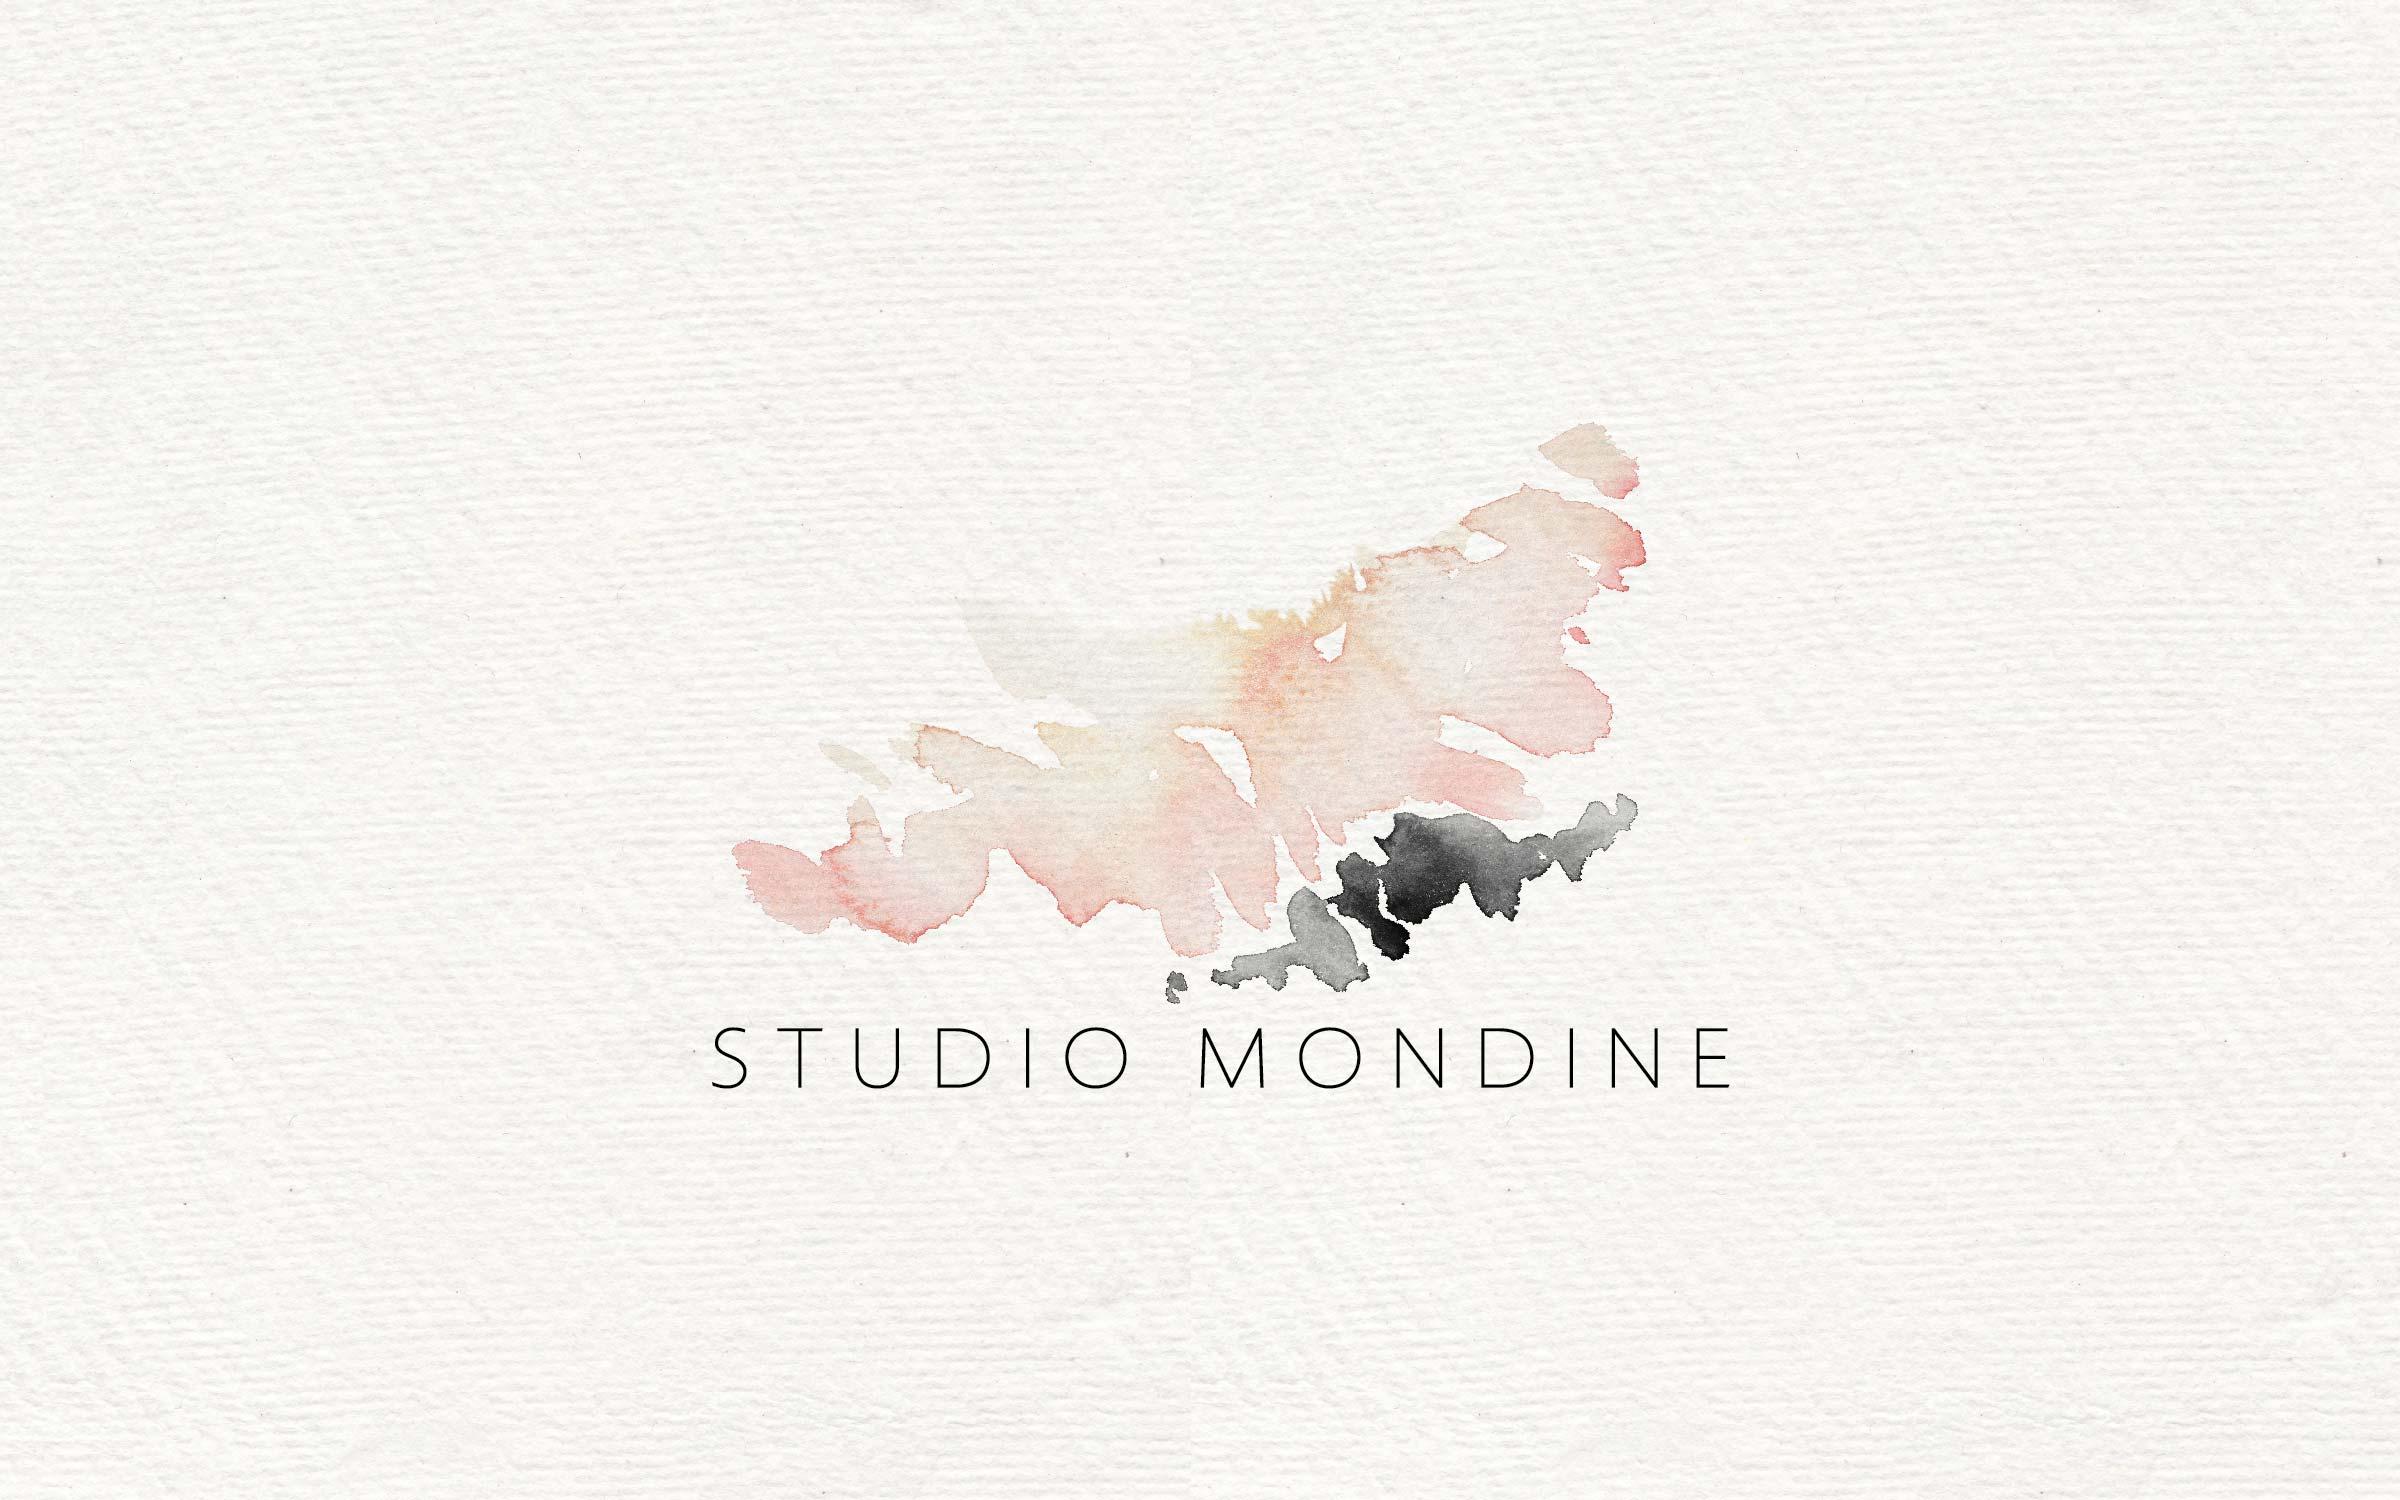 StudioMondine-Portfolio-2019-01.jpg